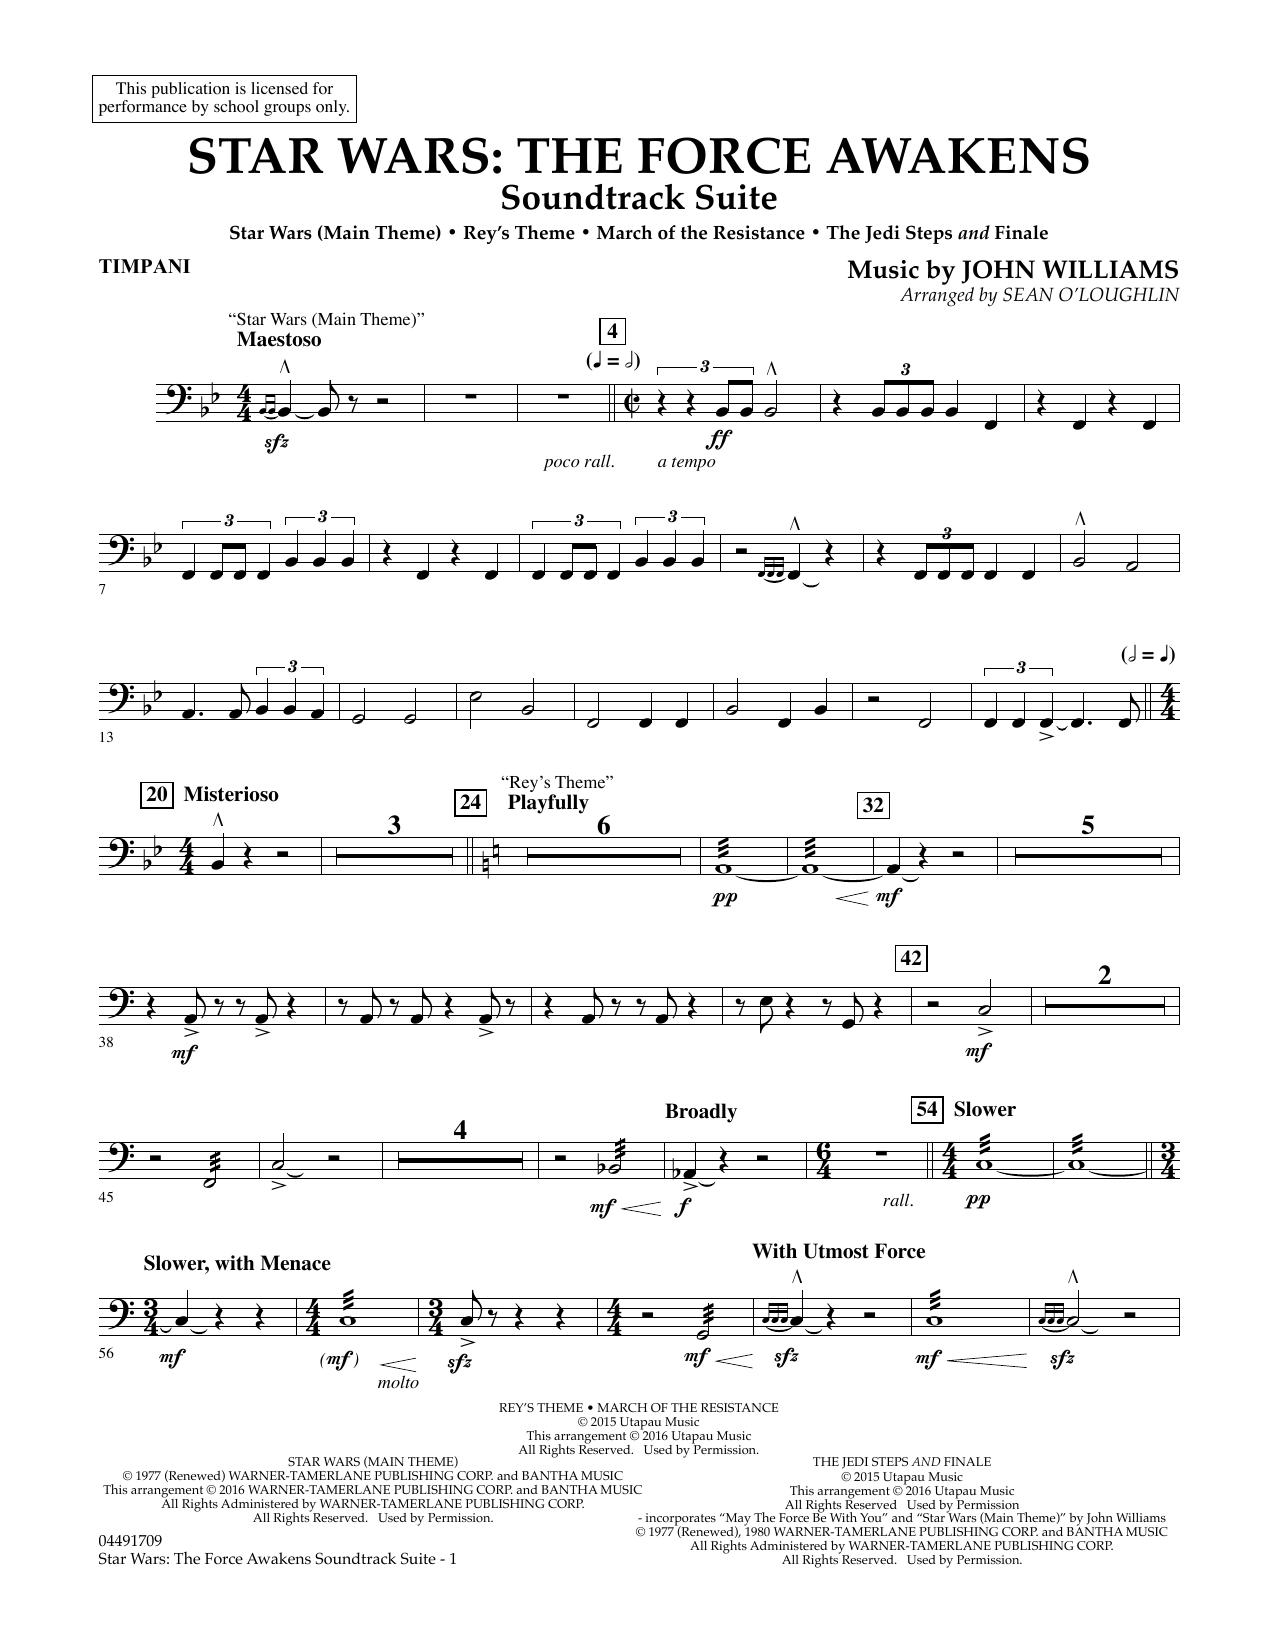 John Williams - Star Wars: The Force Awakens Soundtrack Suite - Timpani